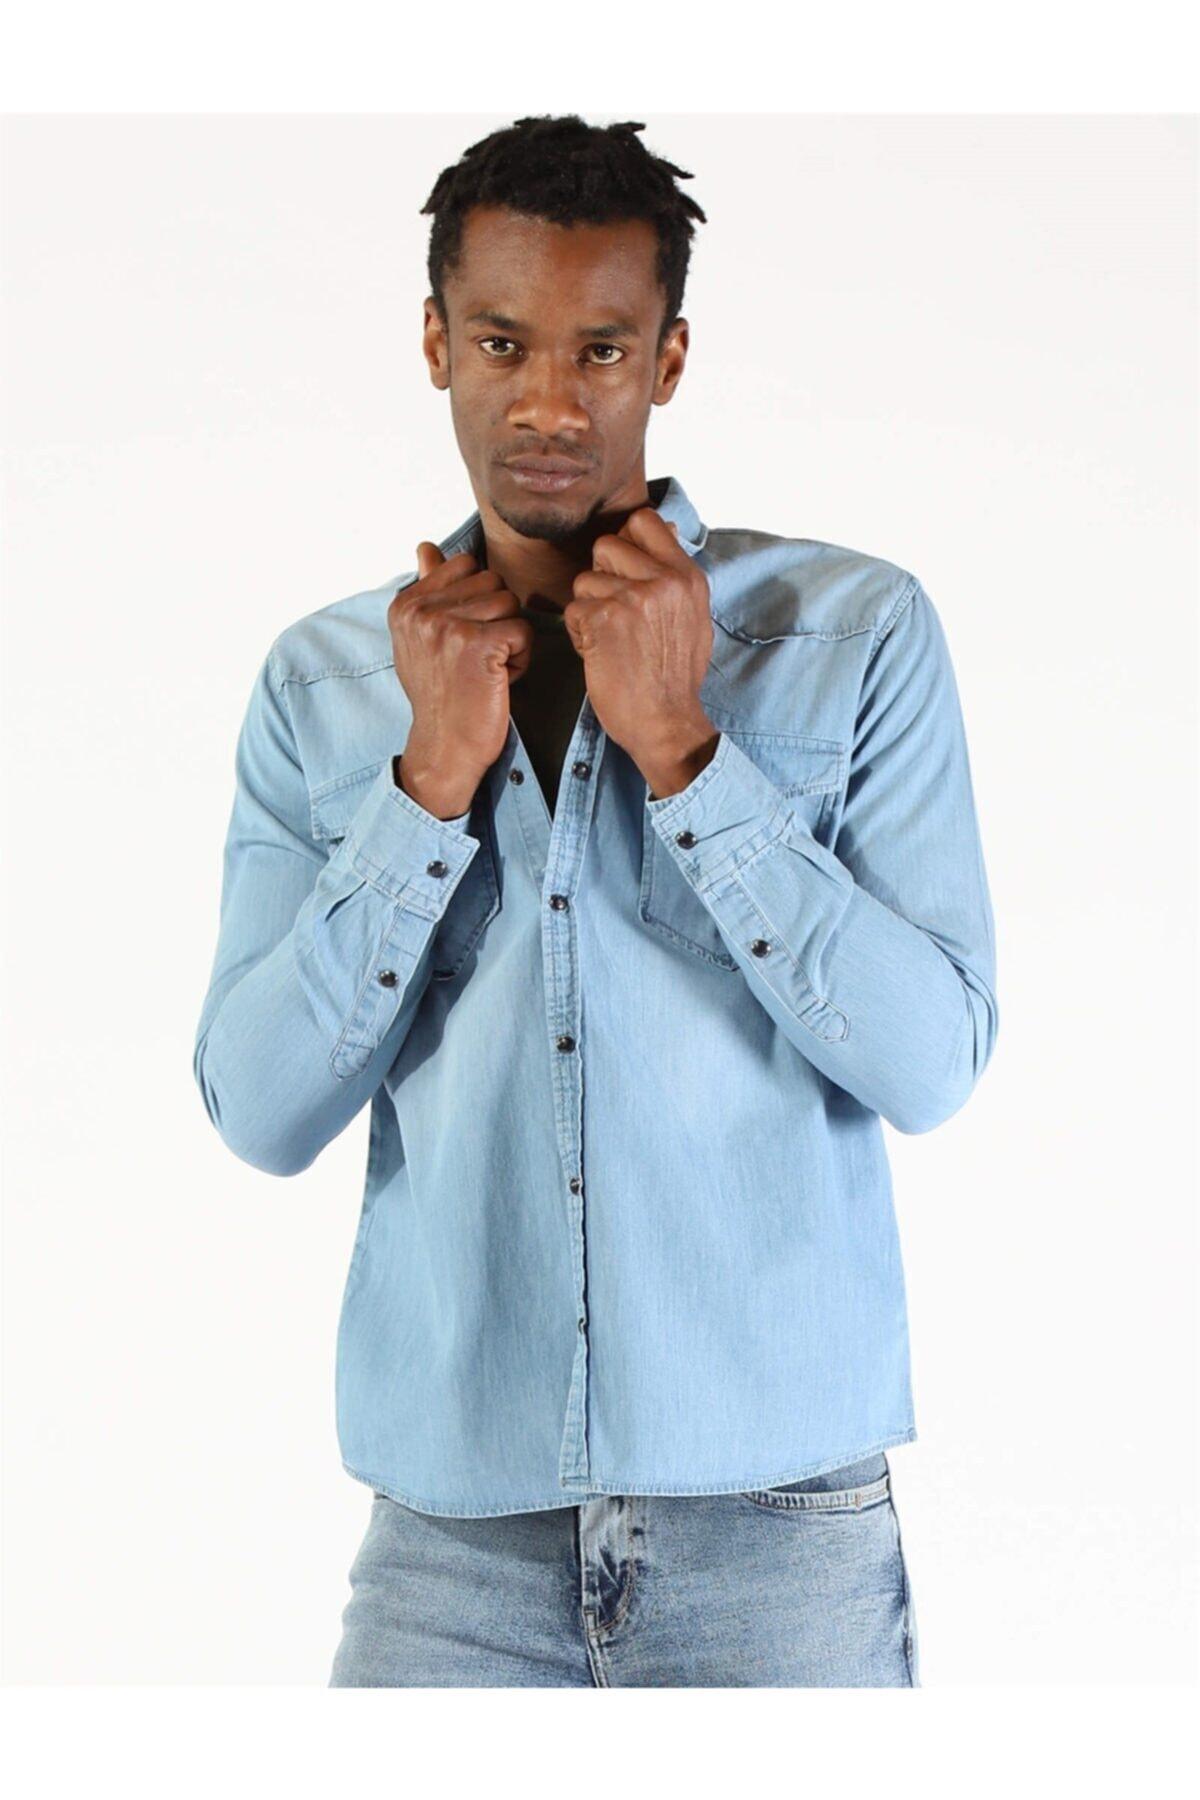 Twister Jeans Twıster Jeans 1704-09 Erkek Çıtçıtlı Çift Cepli Kot Gömlek 2